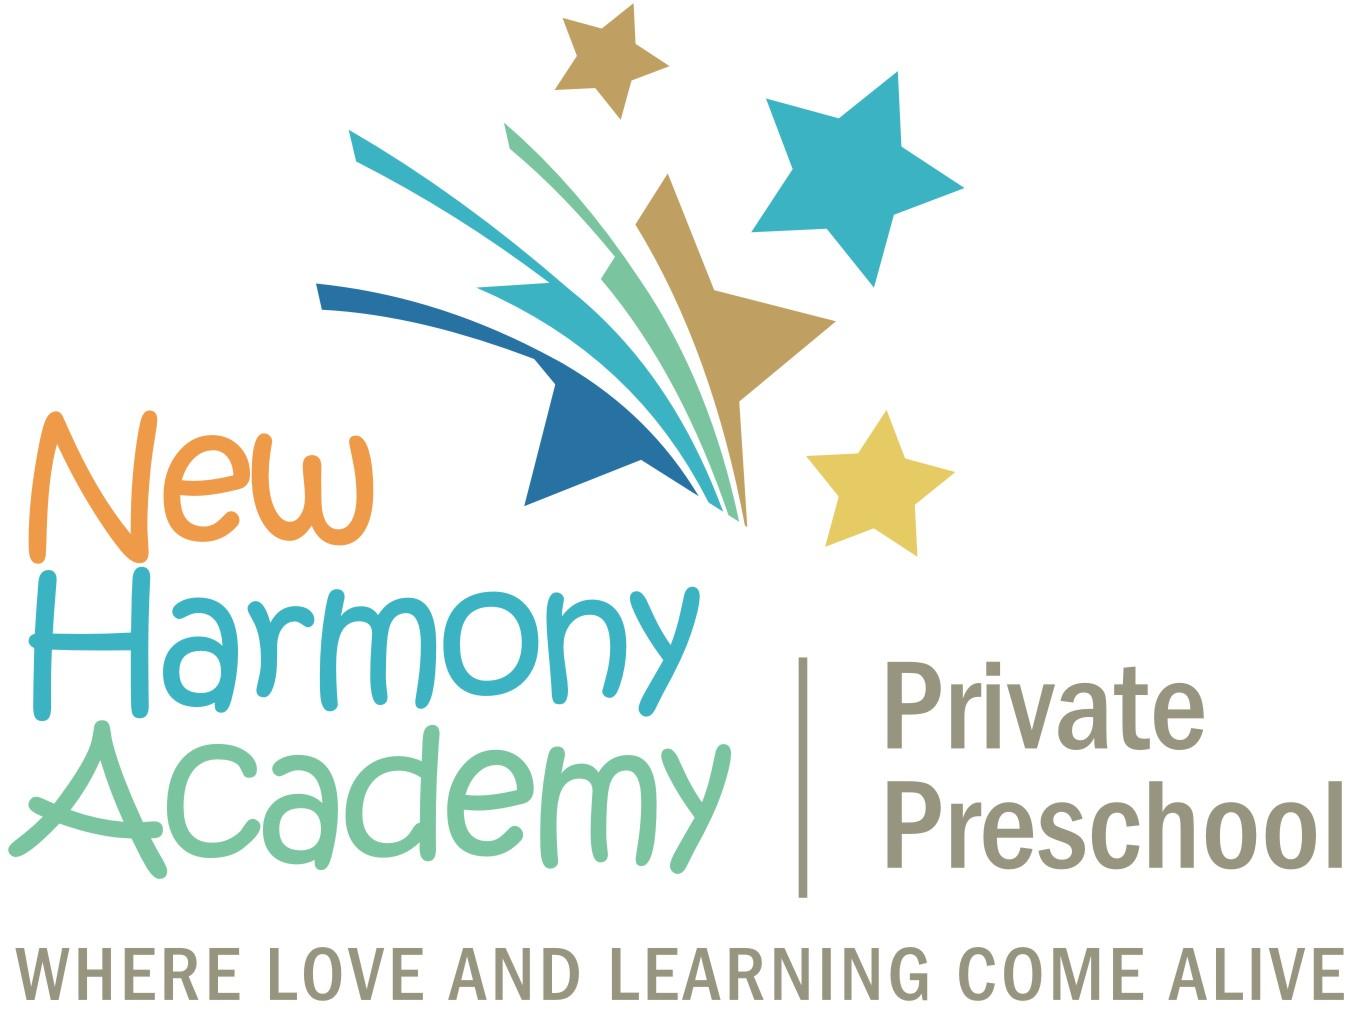 New Harmony Academy